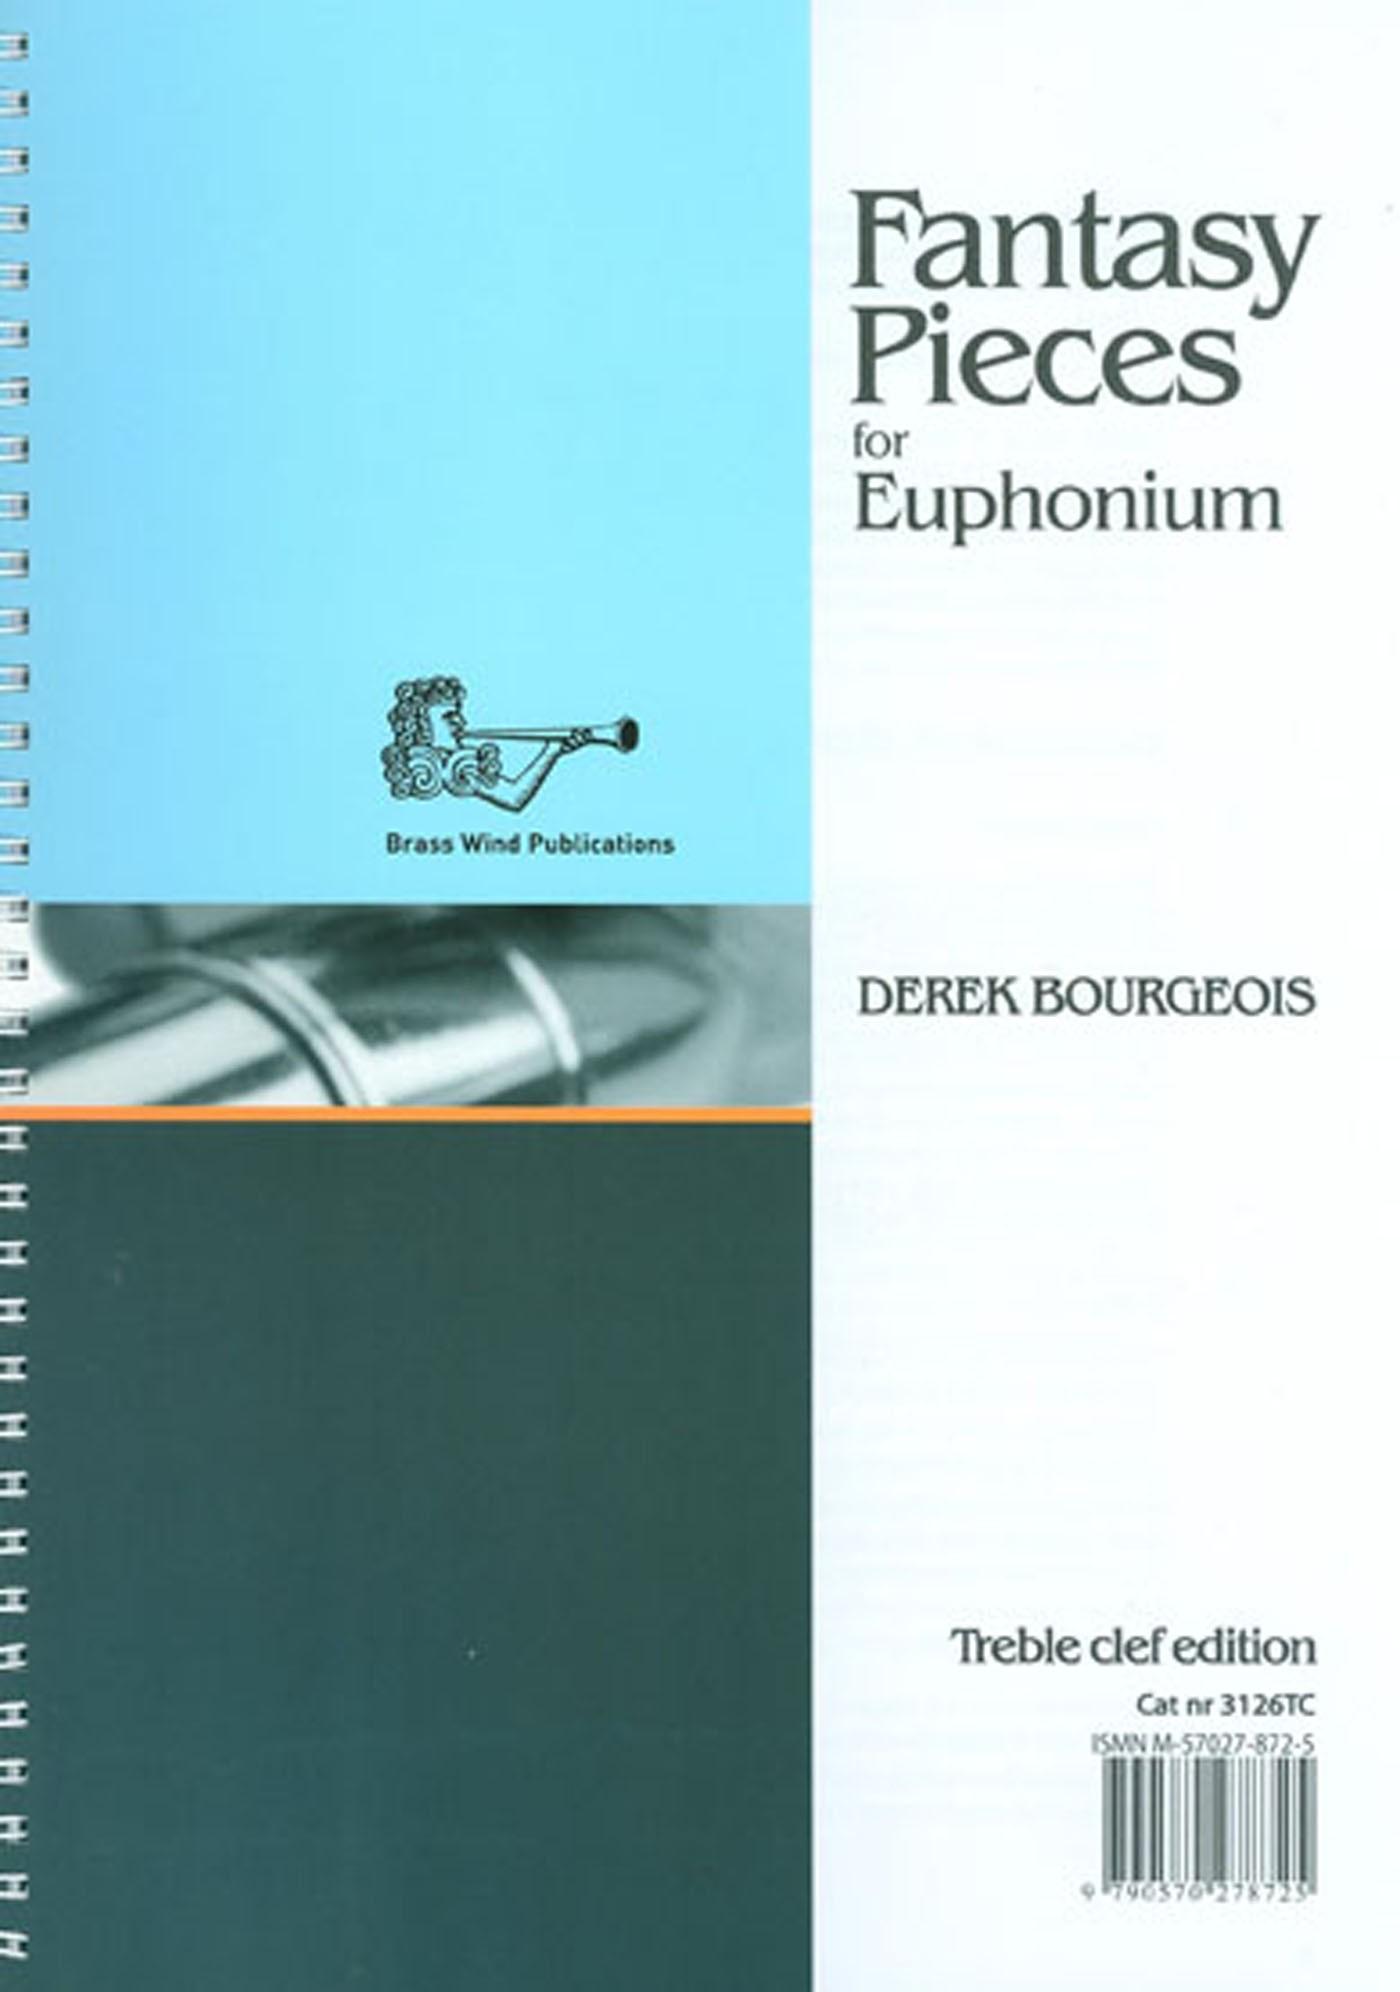 Fantasy Pieces For Euphonium Book Treble Clef Edition Derek Bourgeois S148